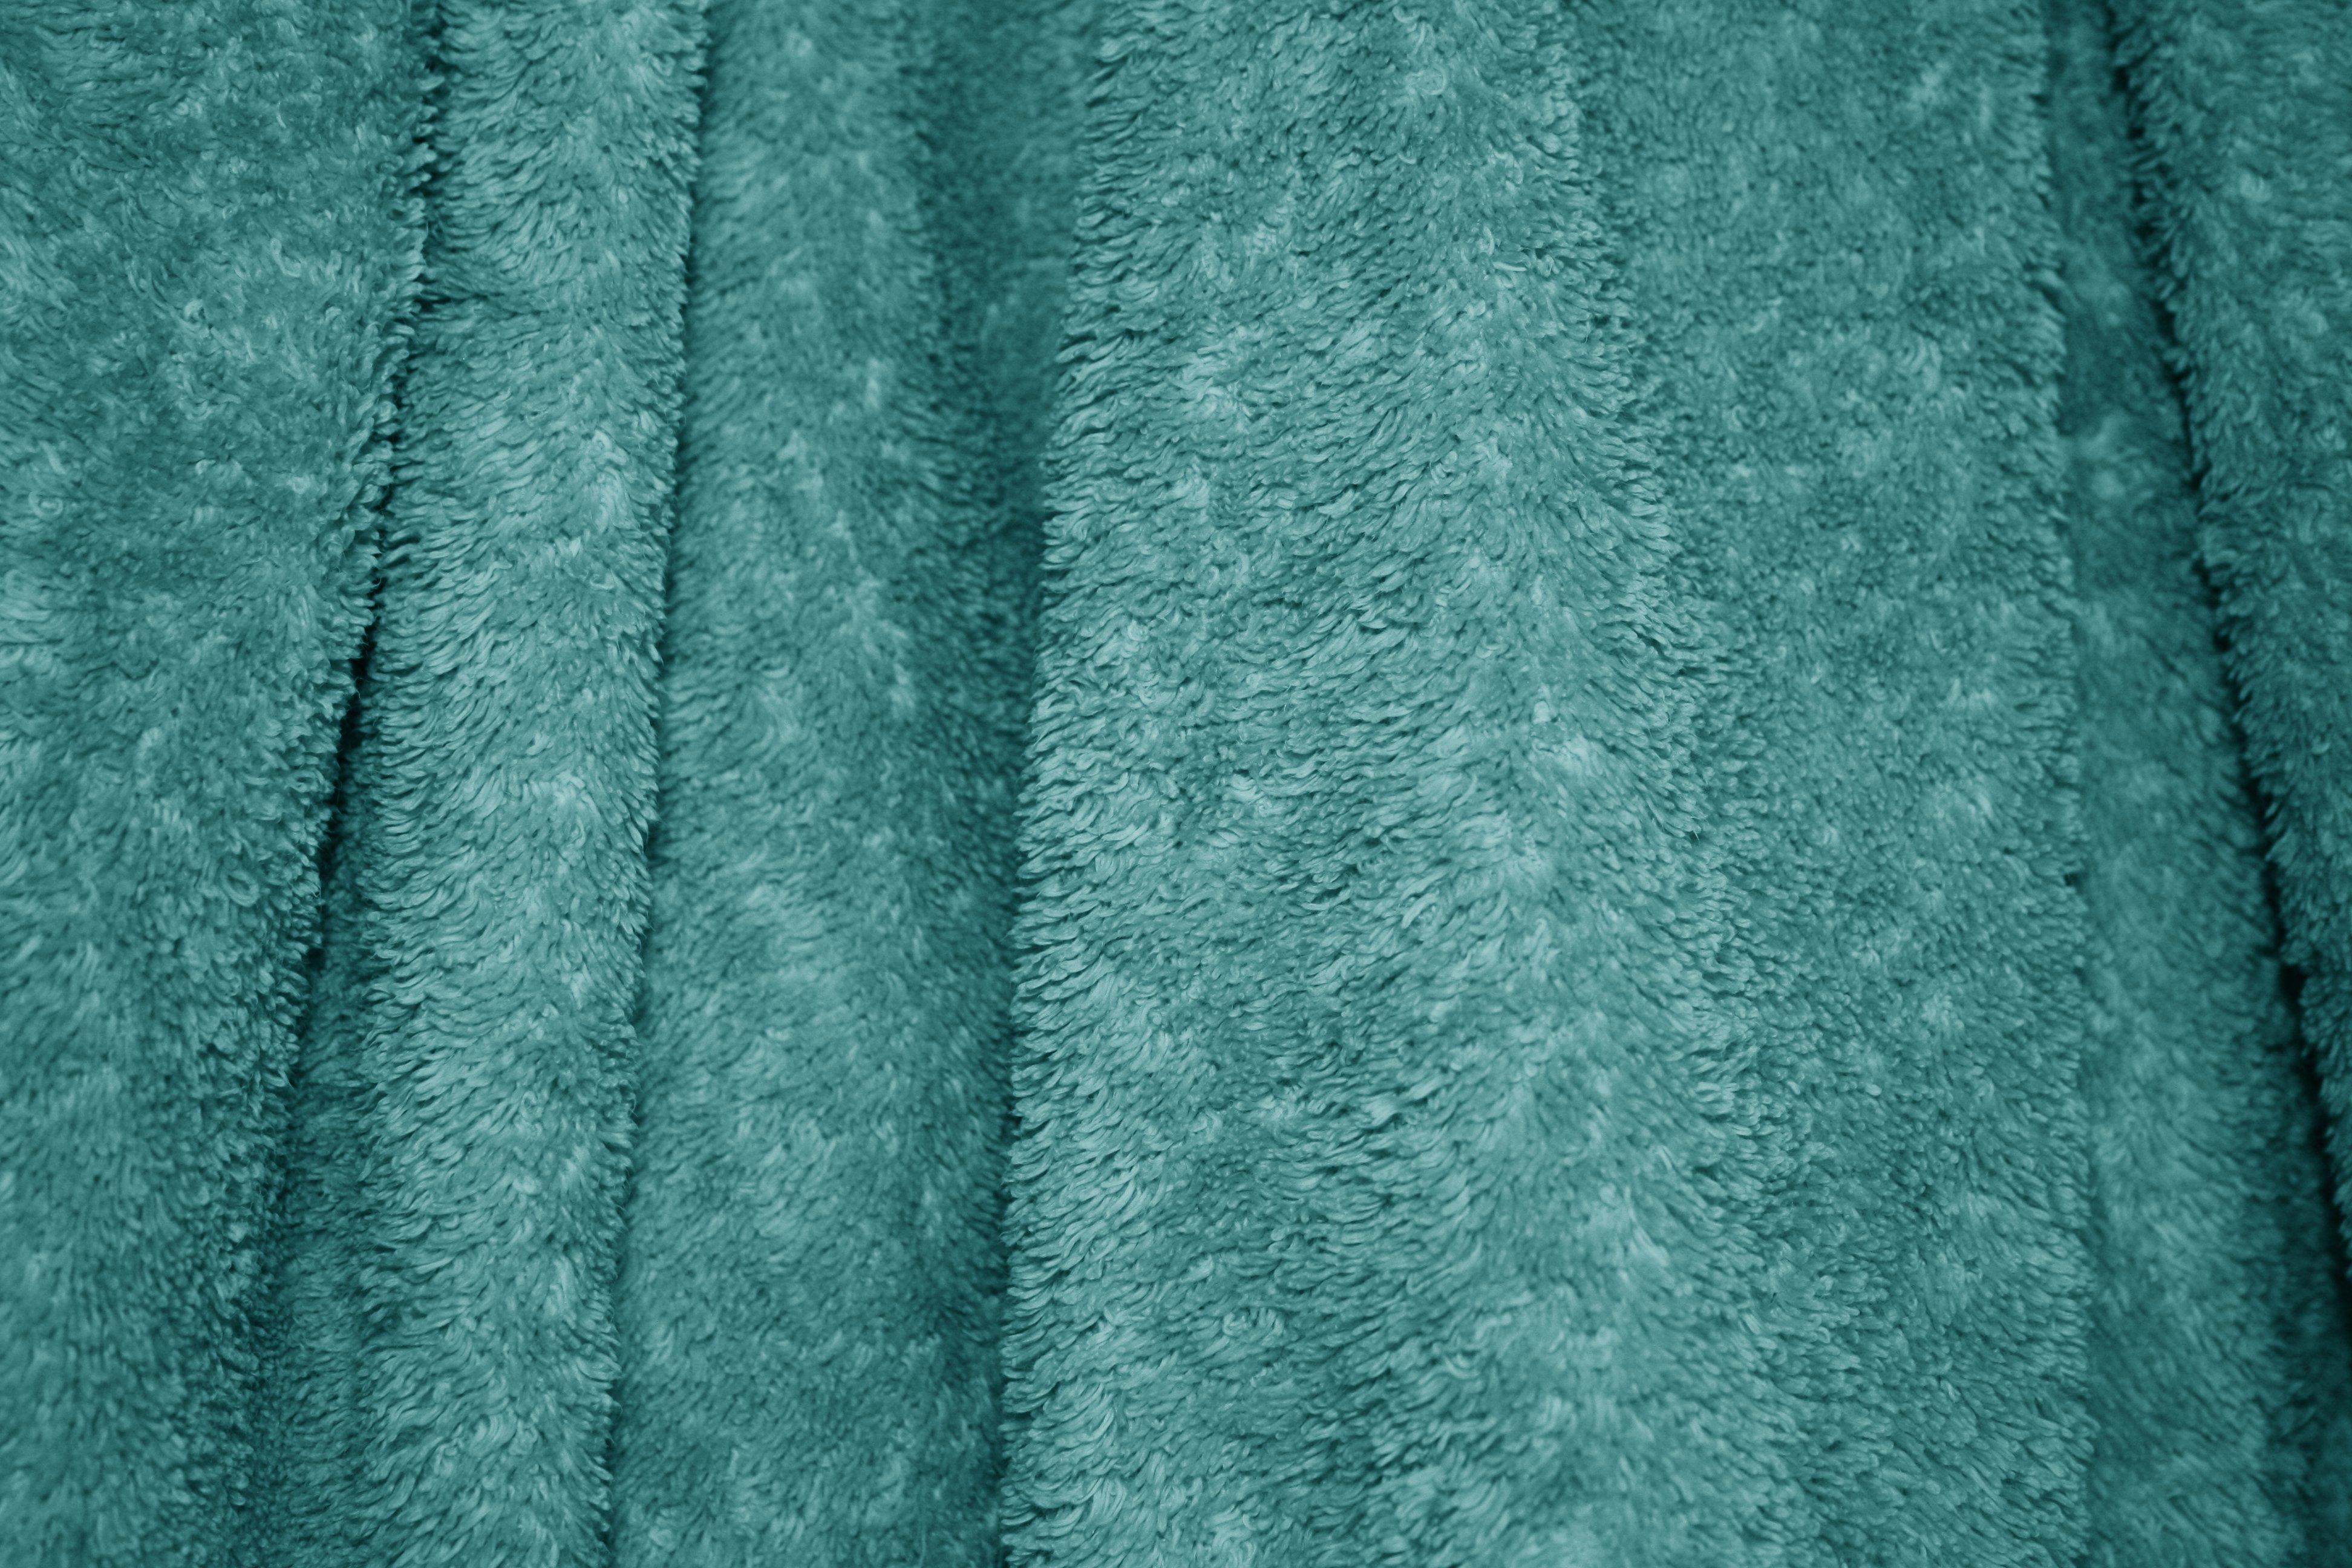 Teal Cloth